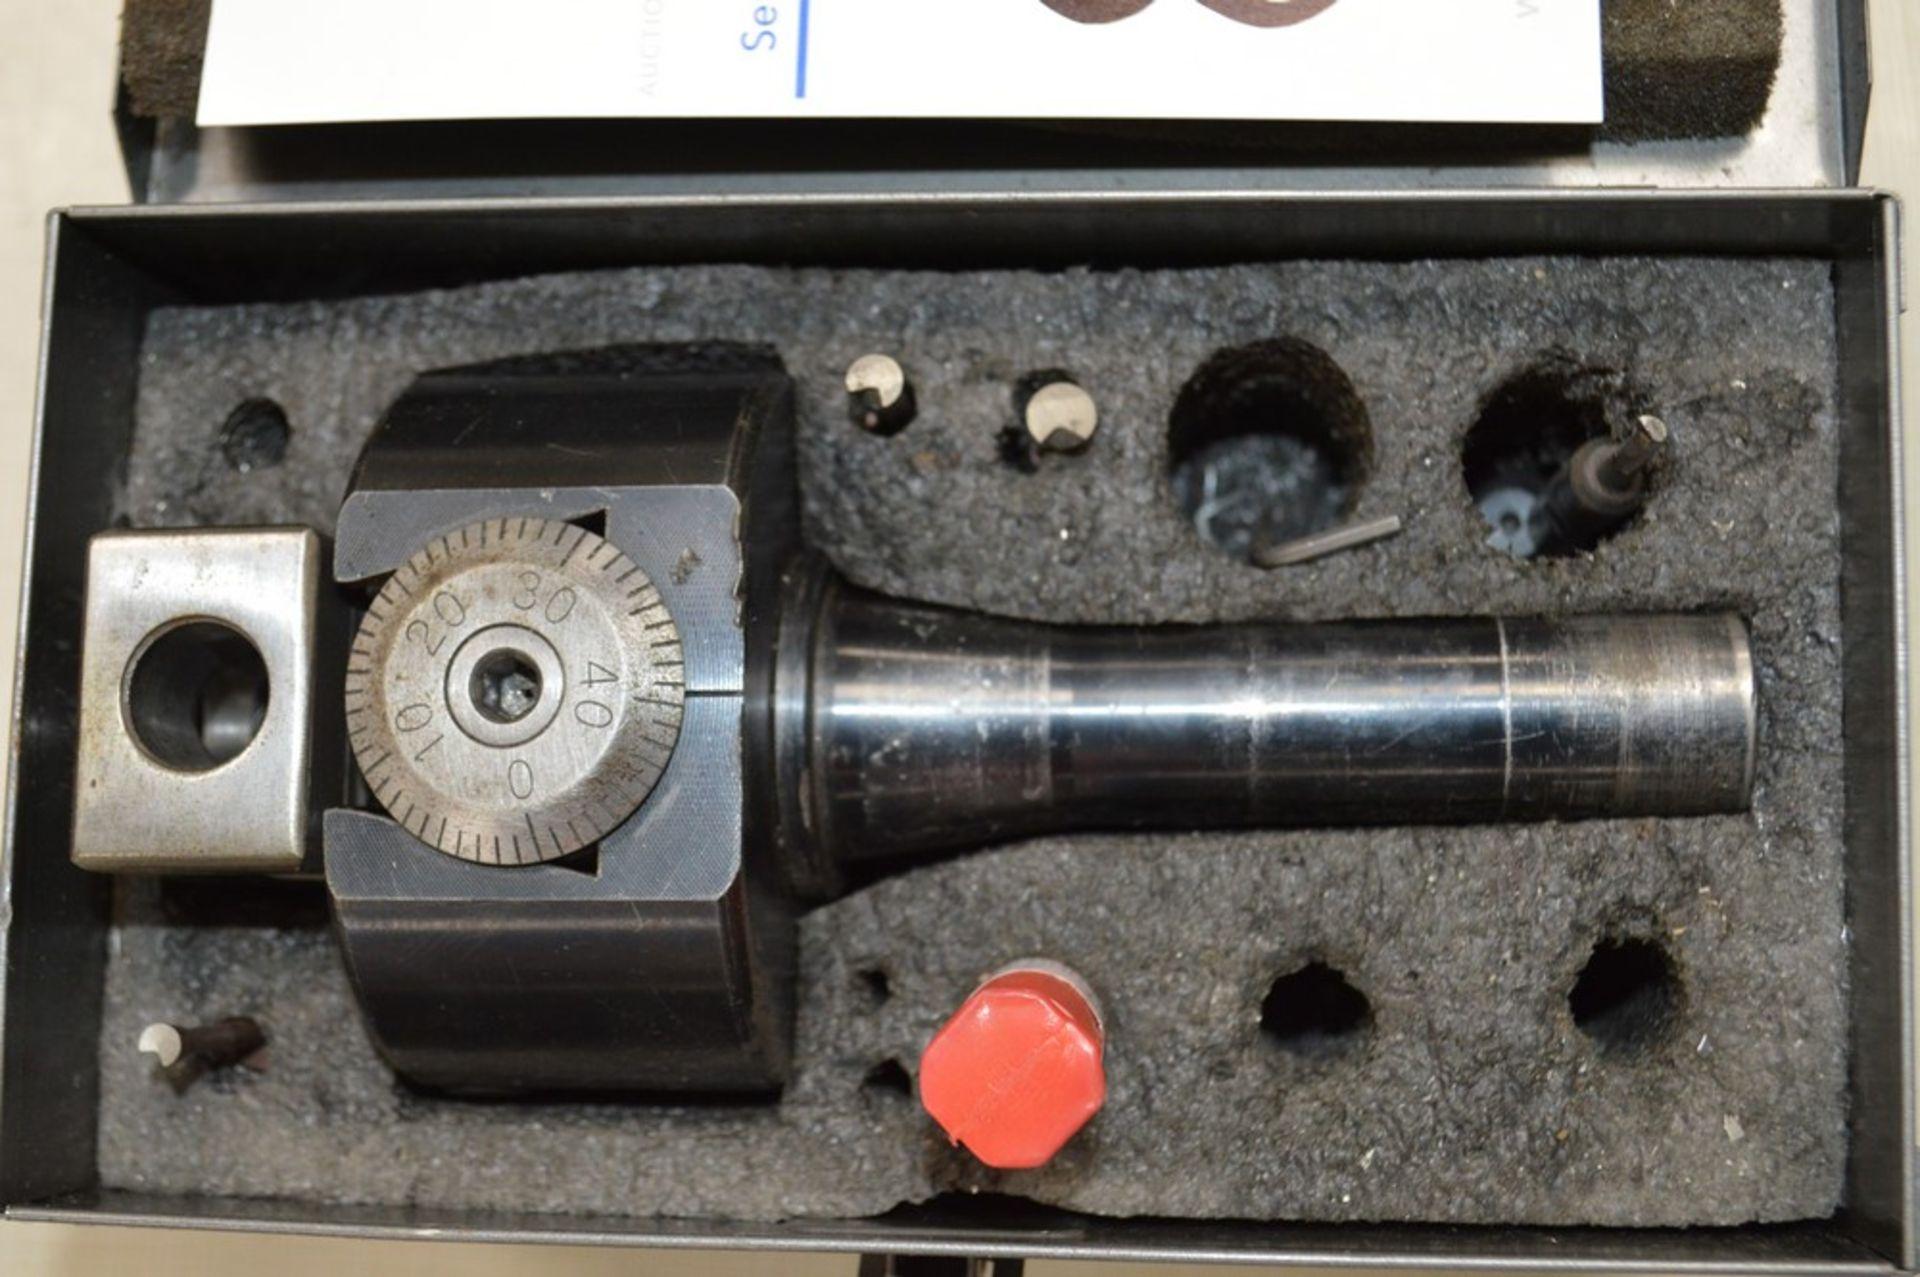 Bridgeport milling adjustable R8 boring head. - Image 2 of 3